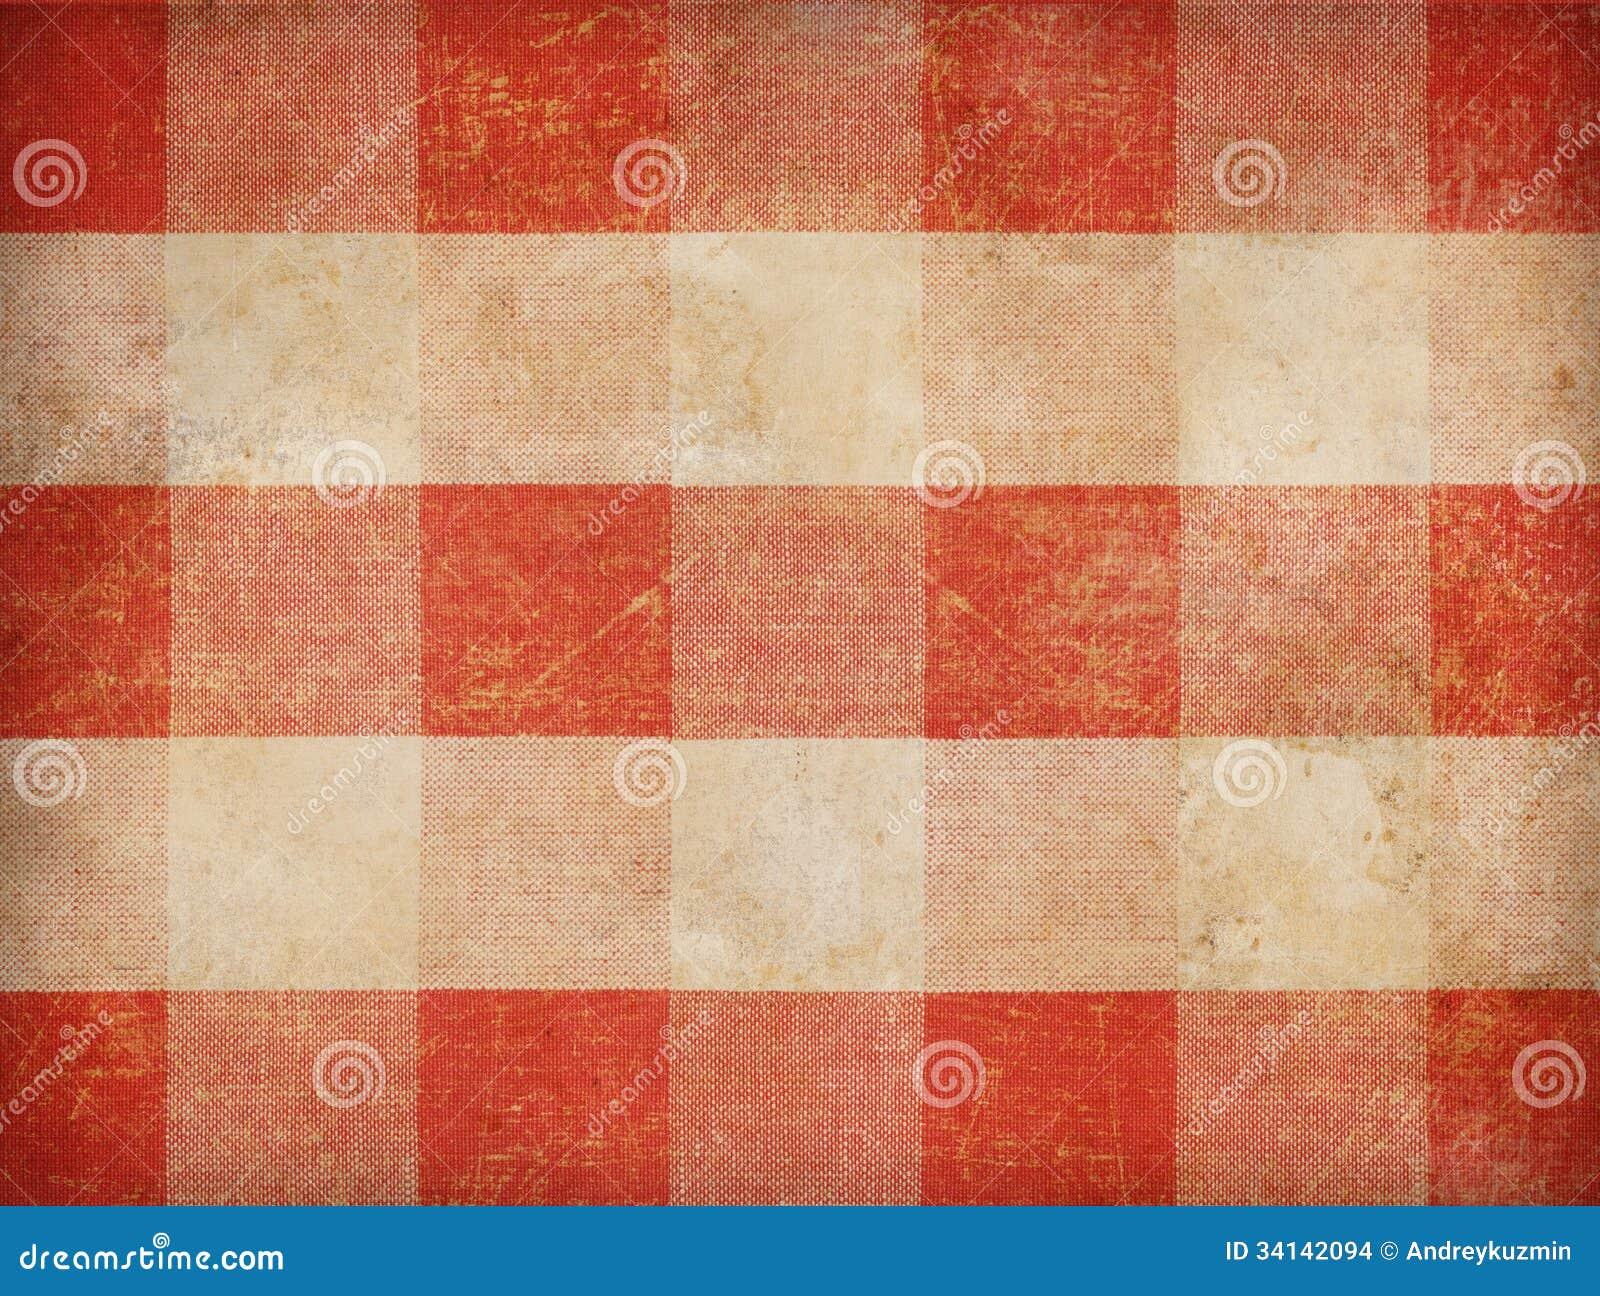 Vintage Gingham Tablecloth Background Stock Images - Image: 34142094